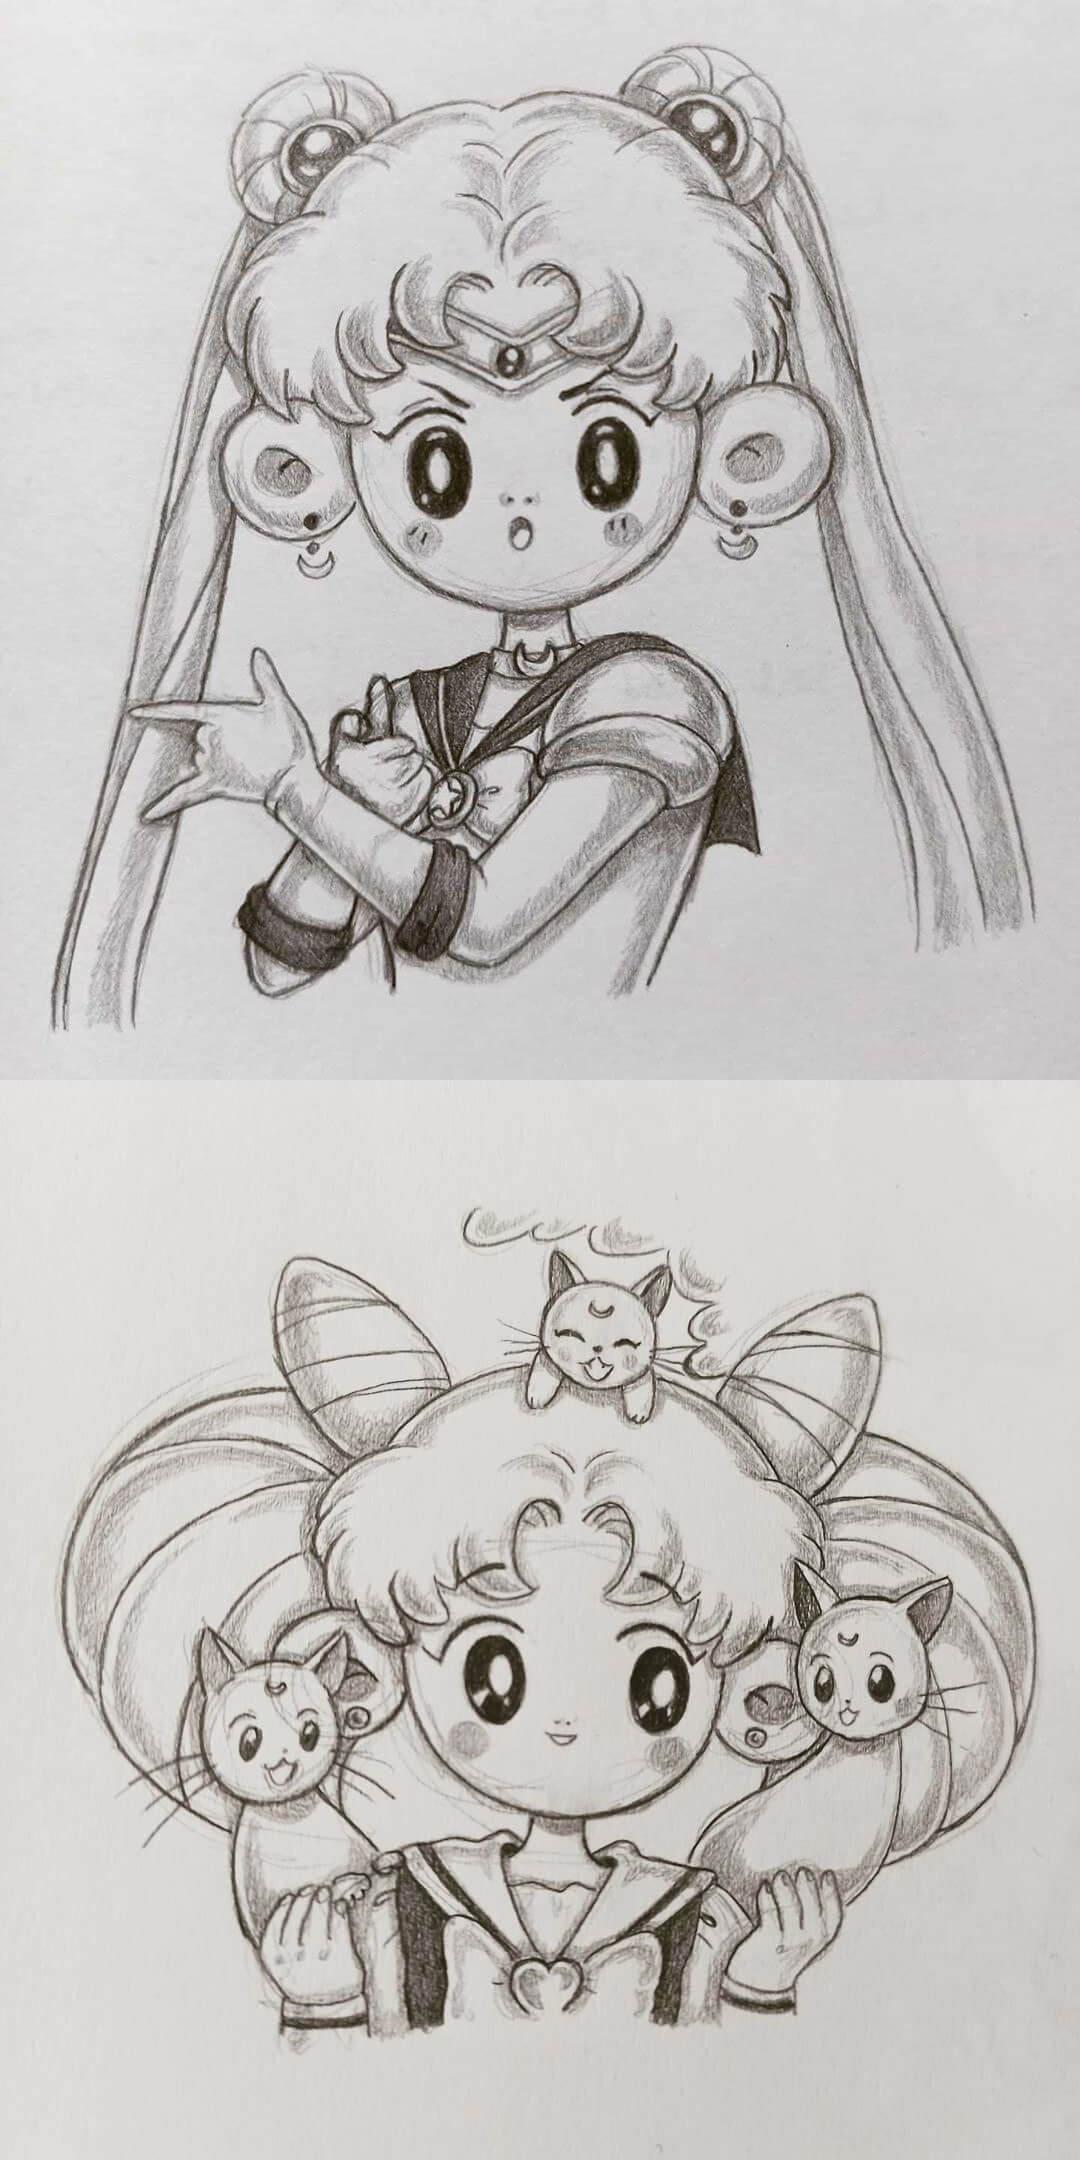 Redraw de Sailormoon by Loli